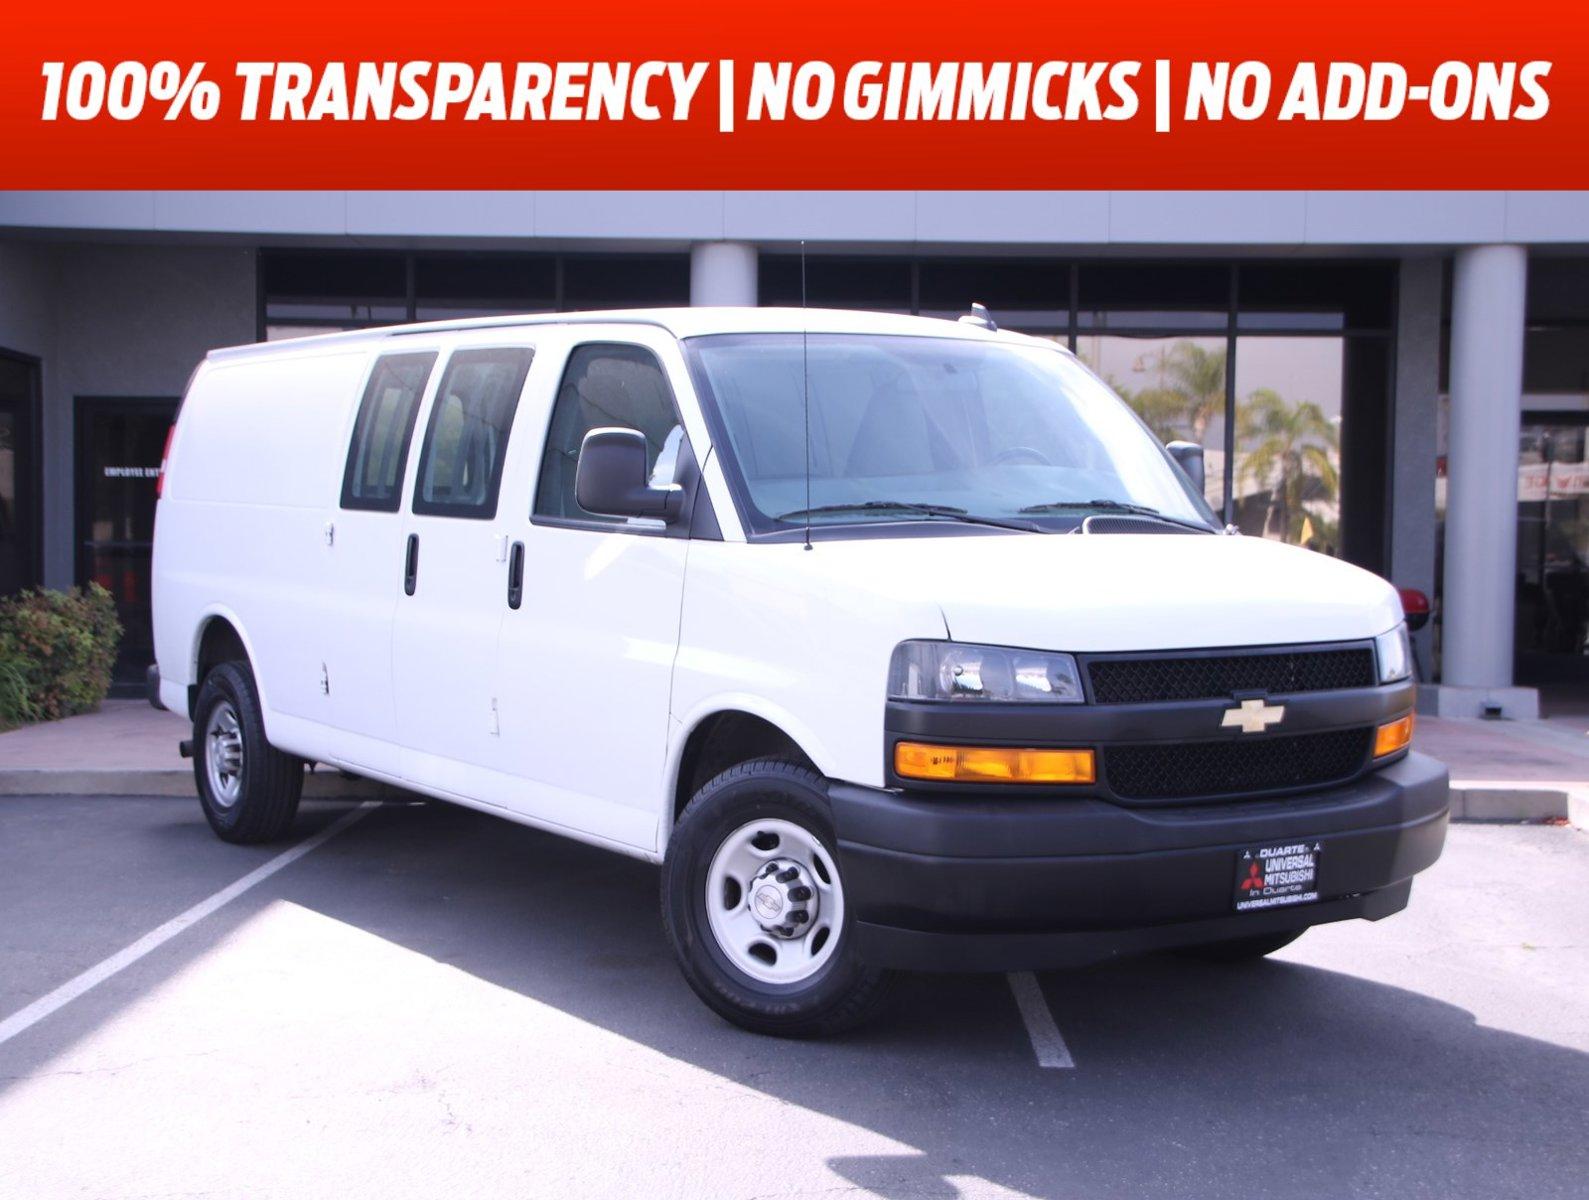 "2020 Chevrolet Express Cargo Van RWD 2500 155"" Gas/Ethanol V8 6.0L/364 [12]"